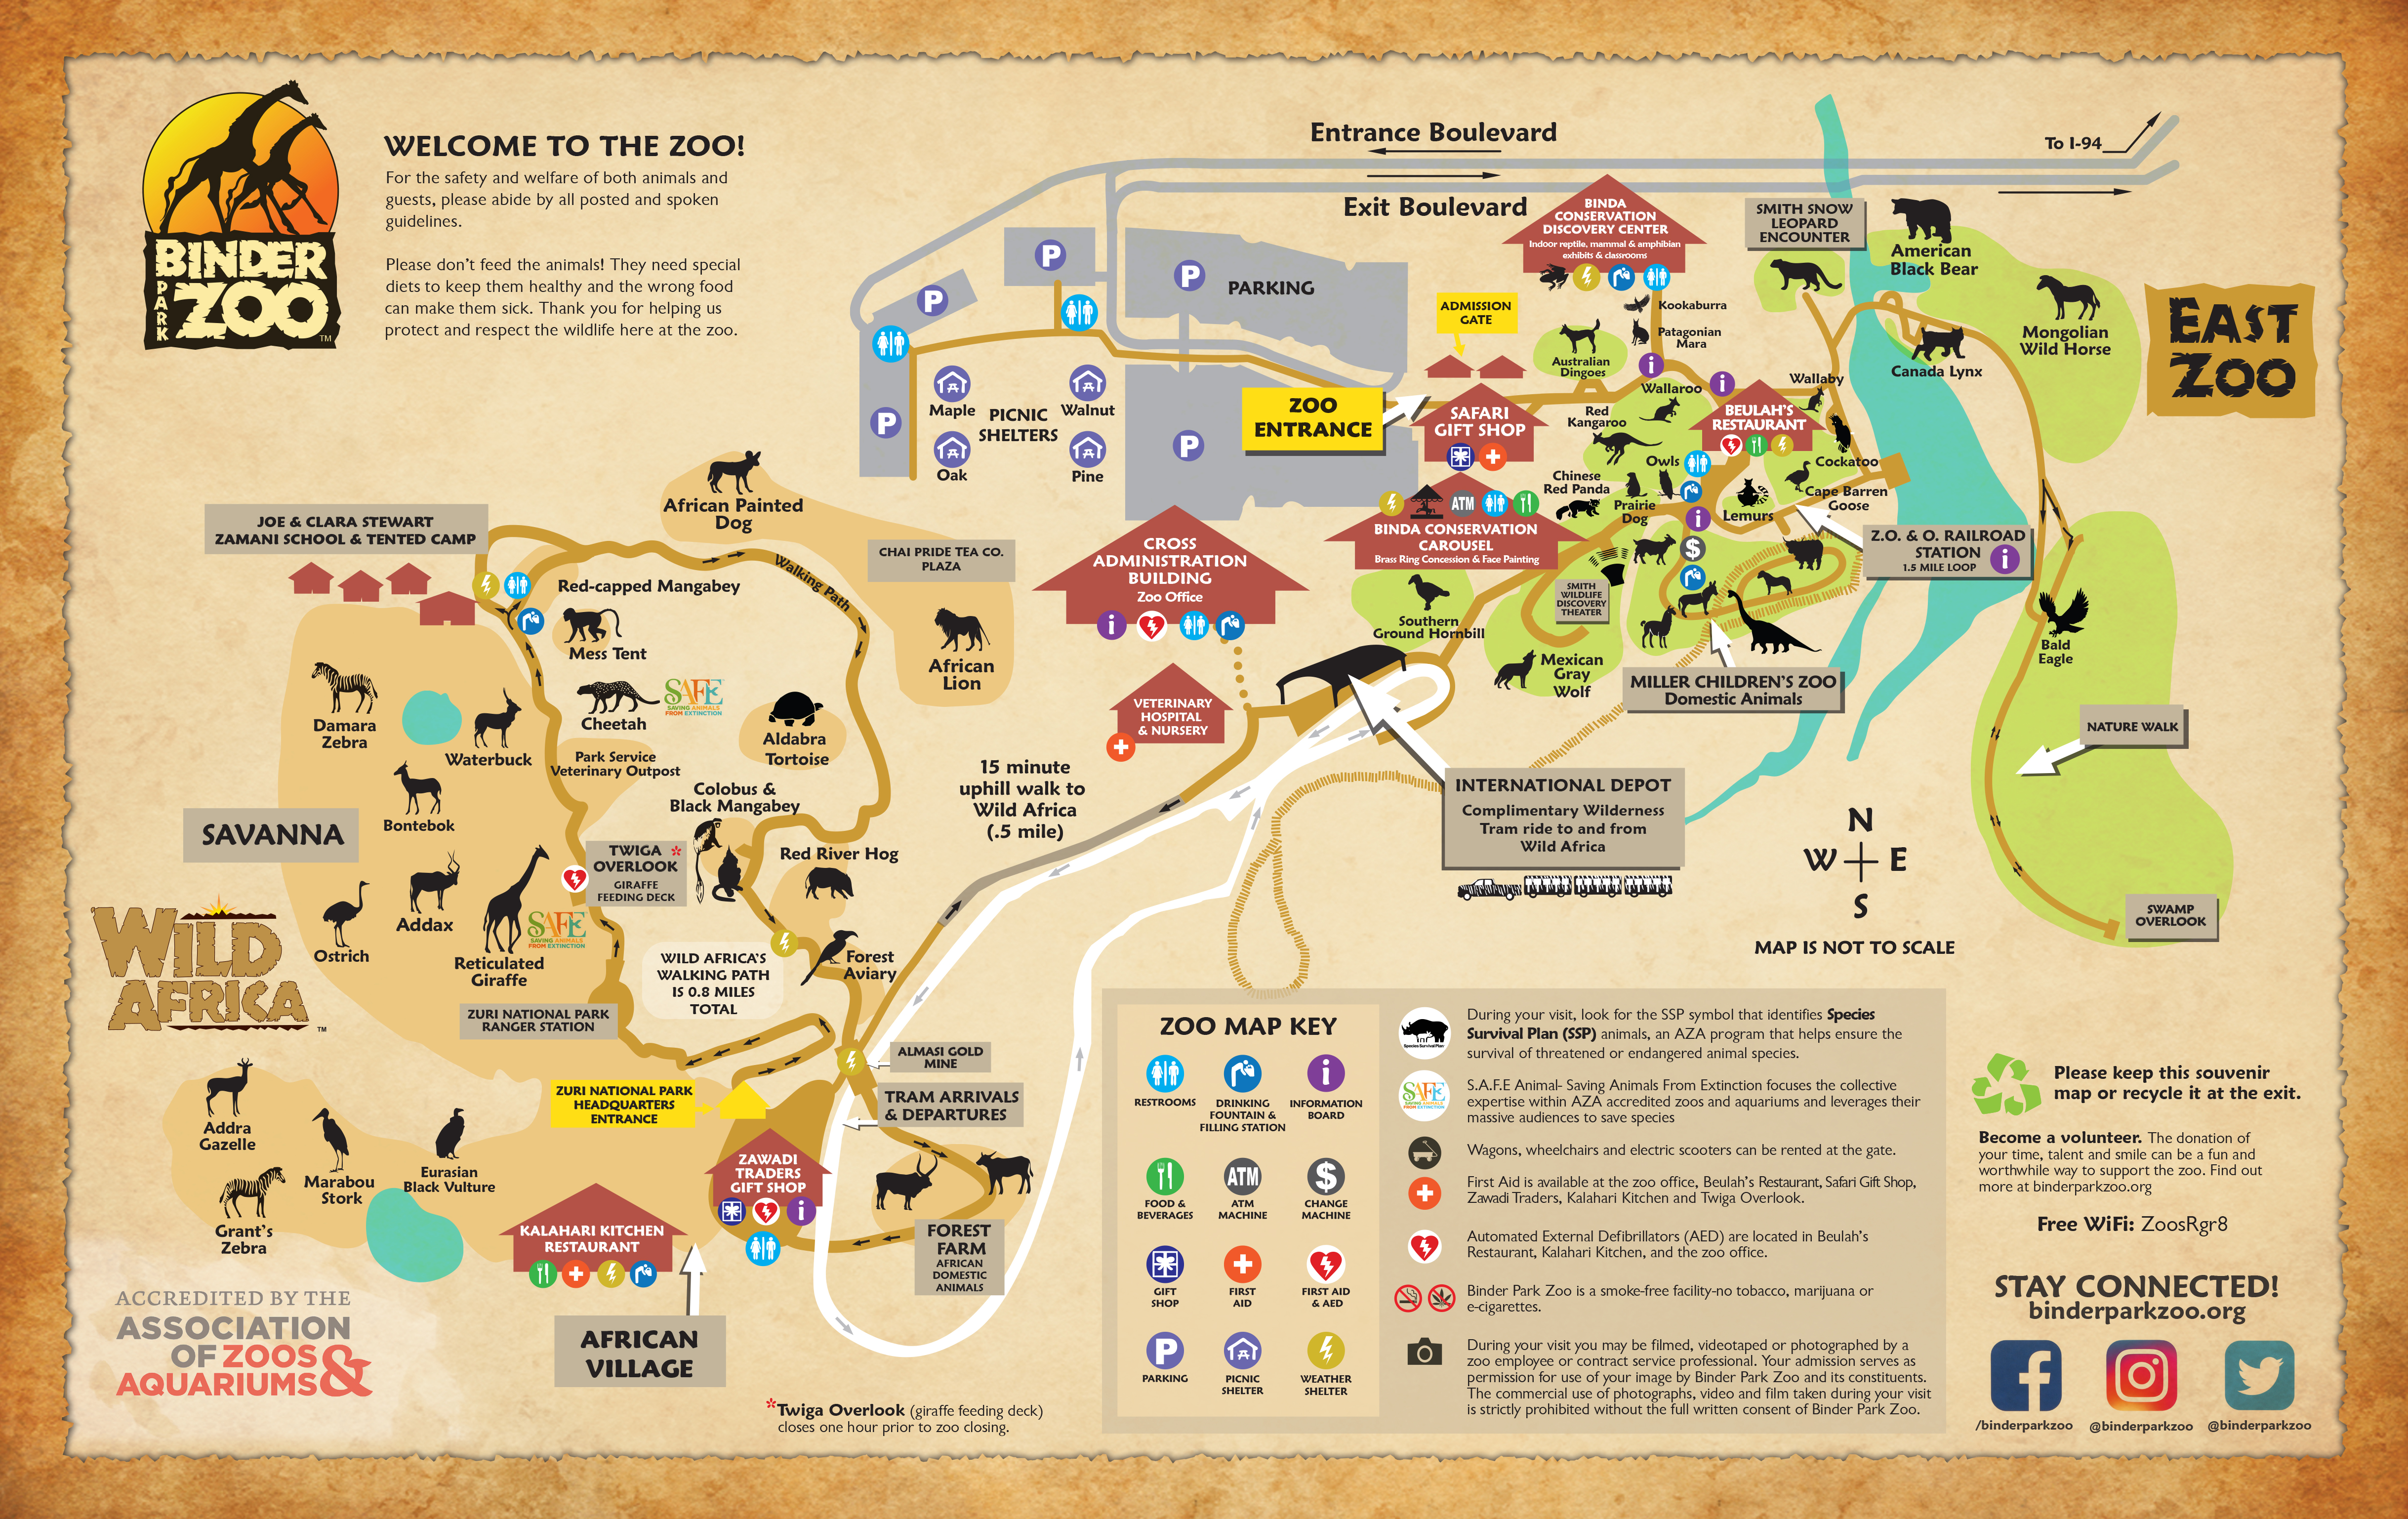 Zoo Map - Binder Park Zoo Zoo Map on